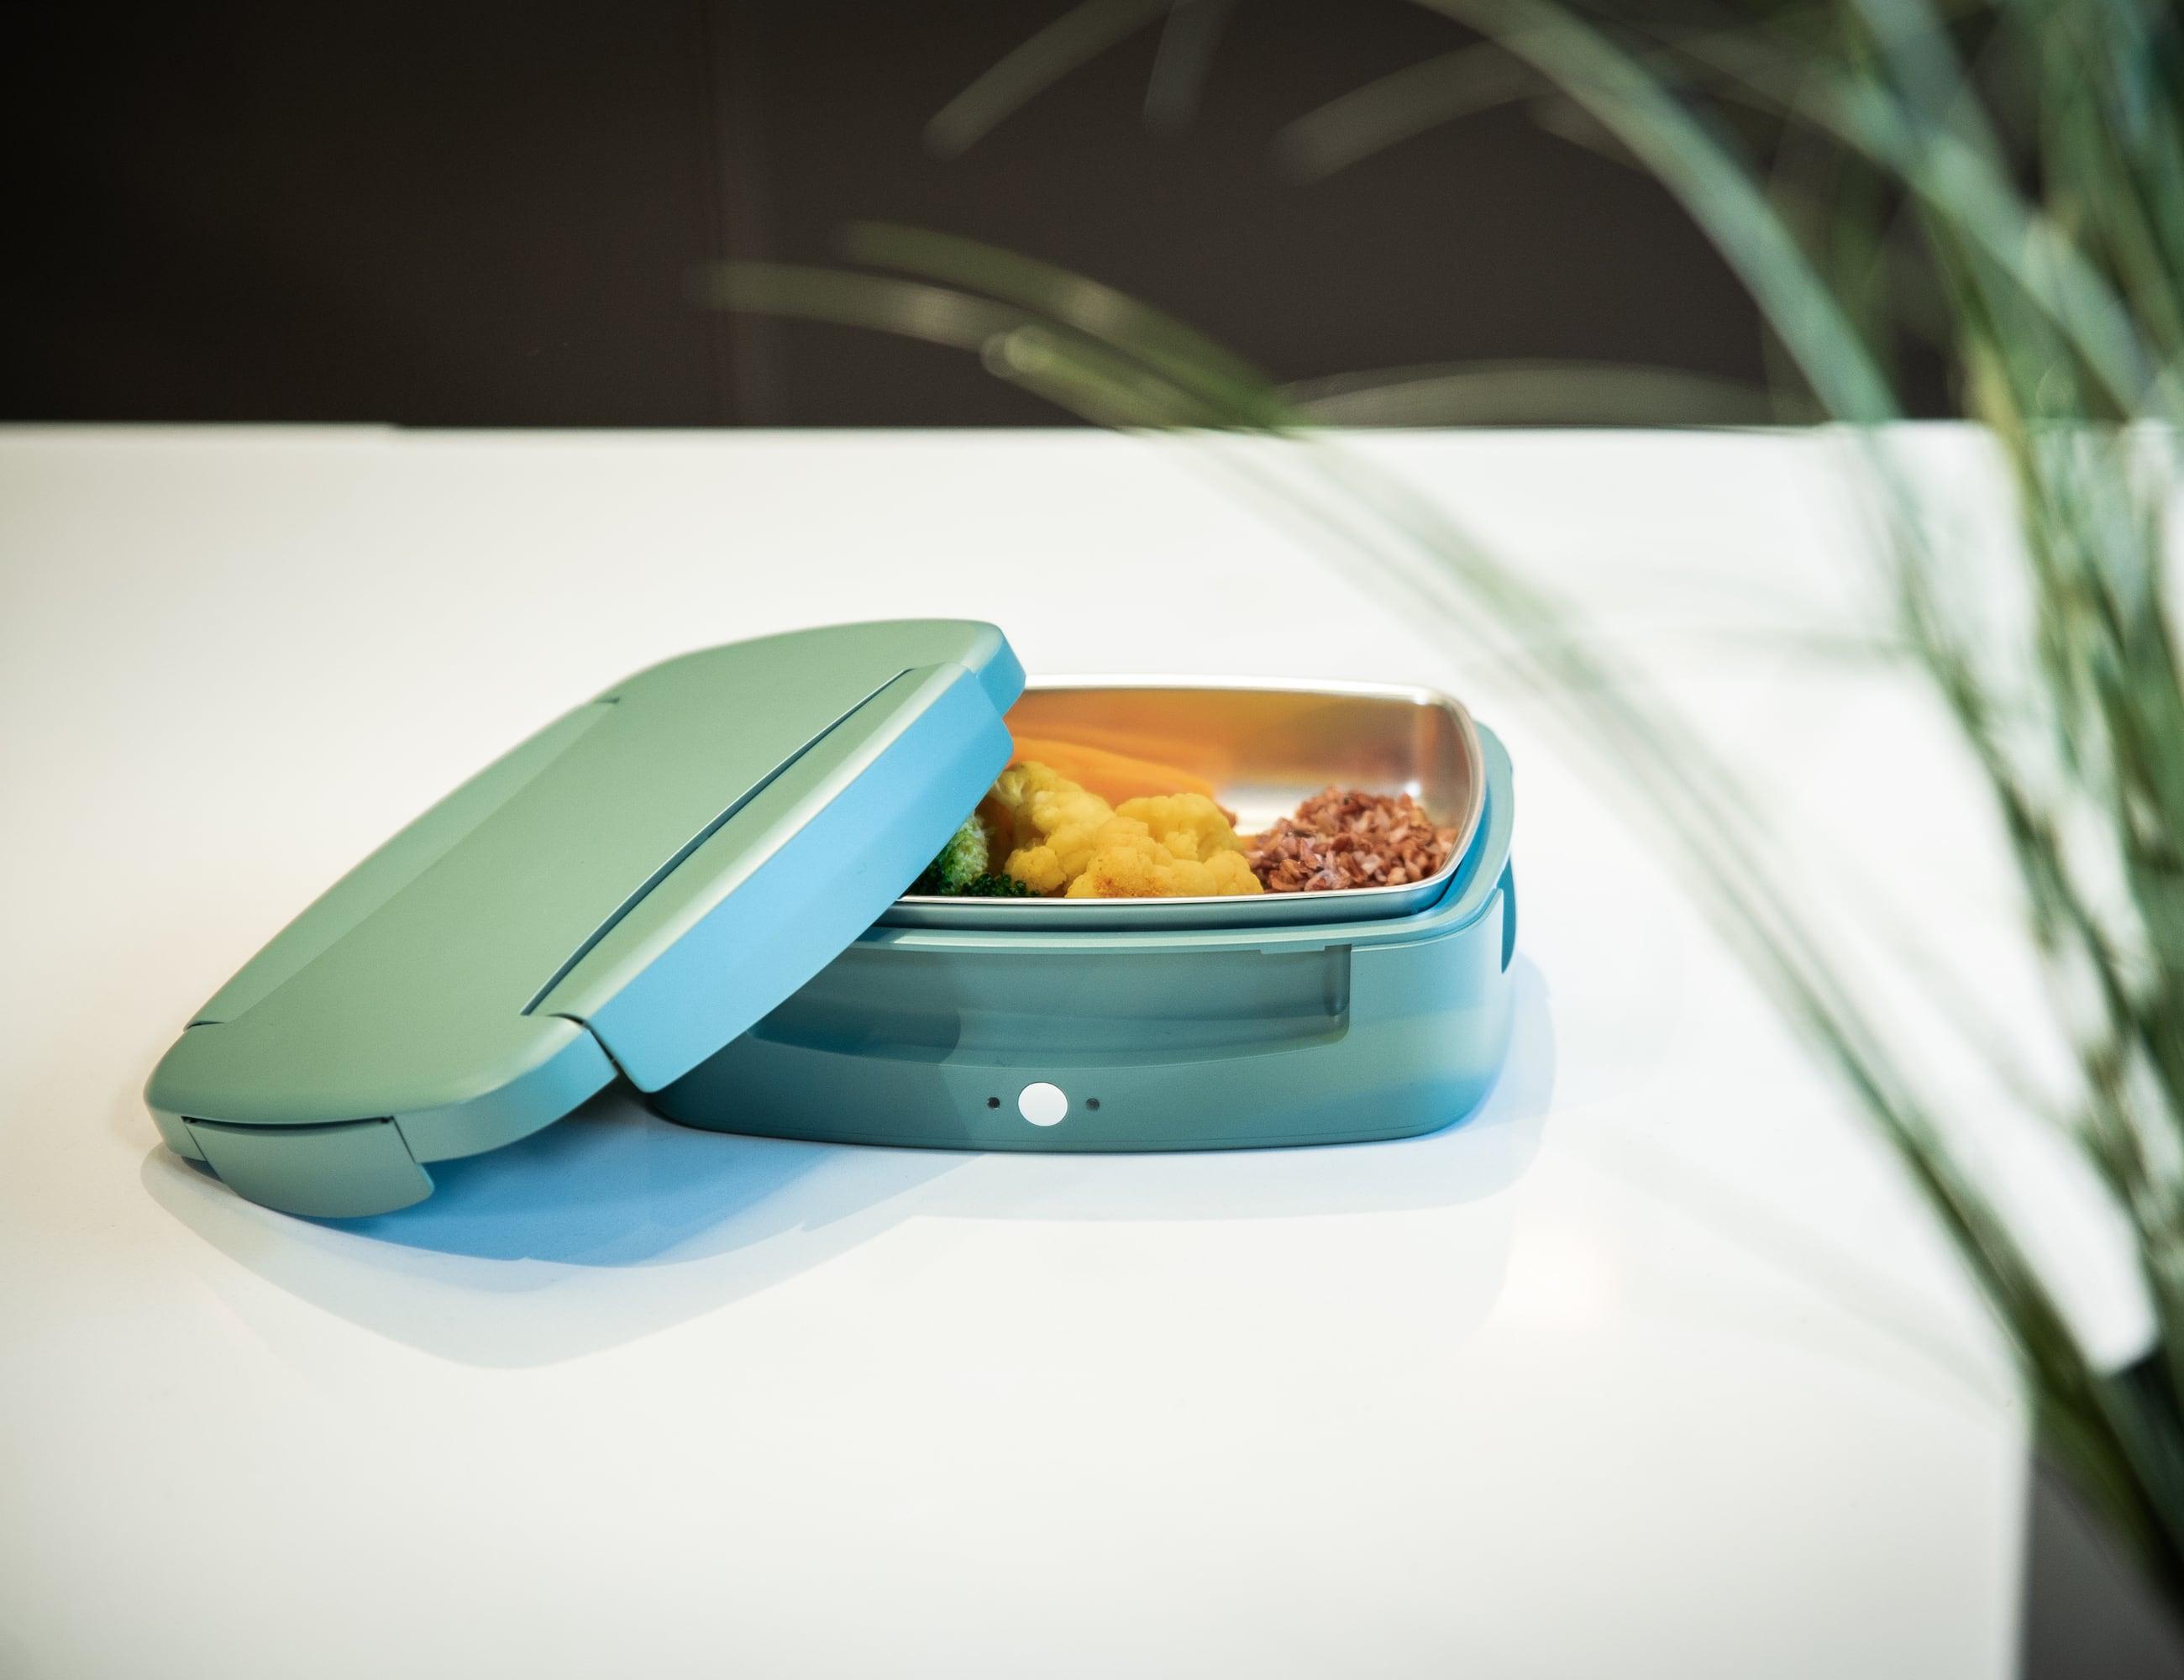 Steasy Smart Portable Steamer